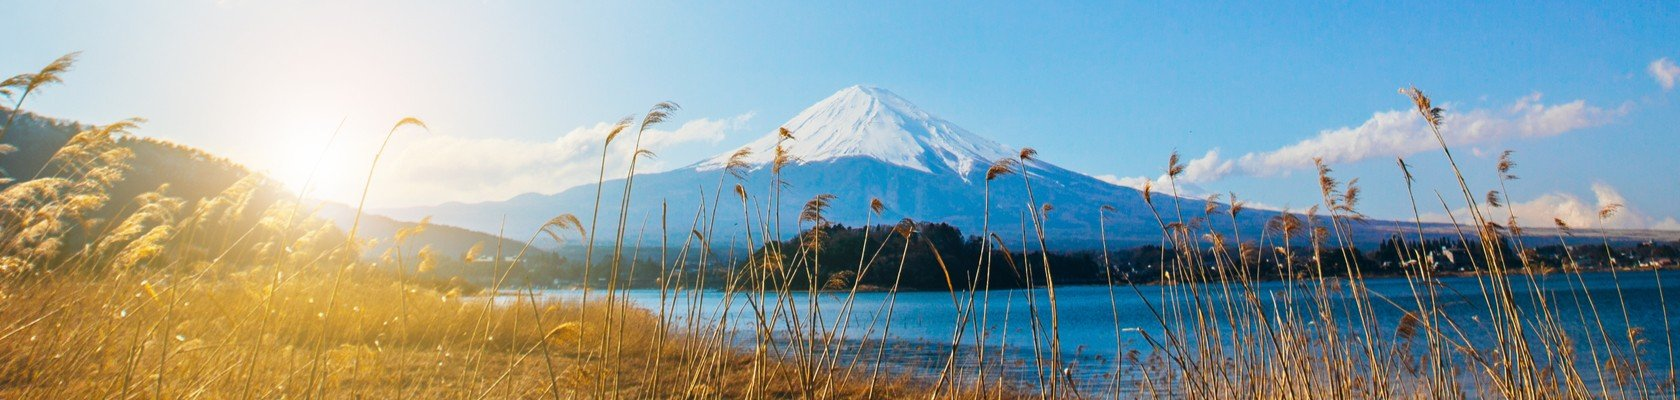 De beroemde Mount Fuji